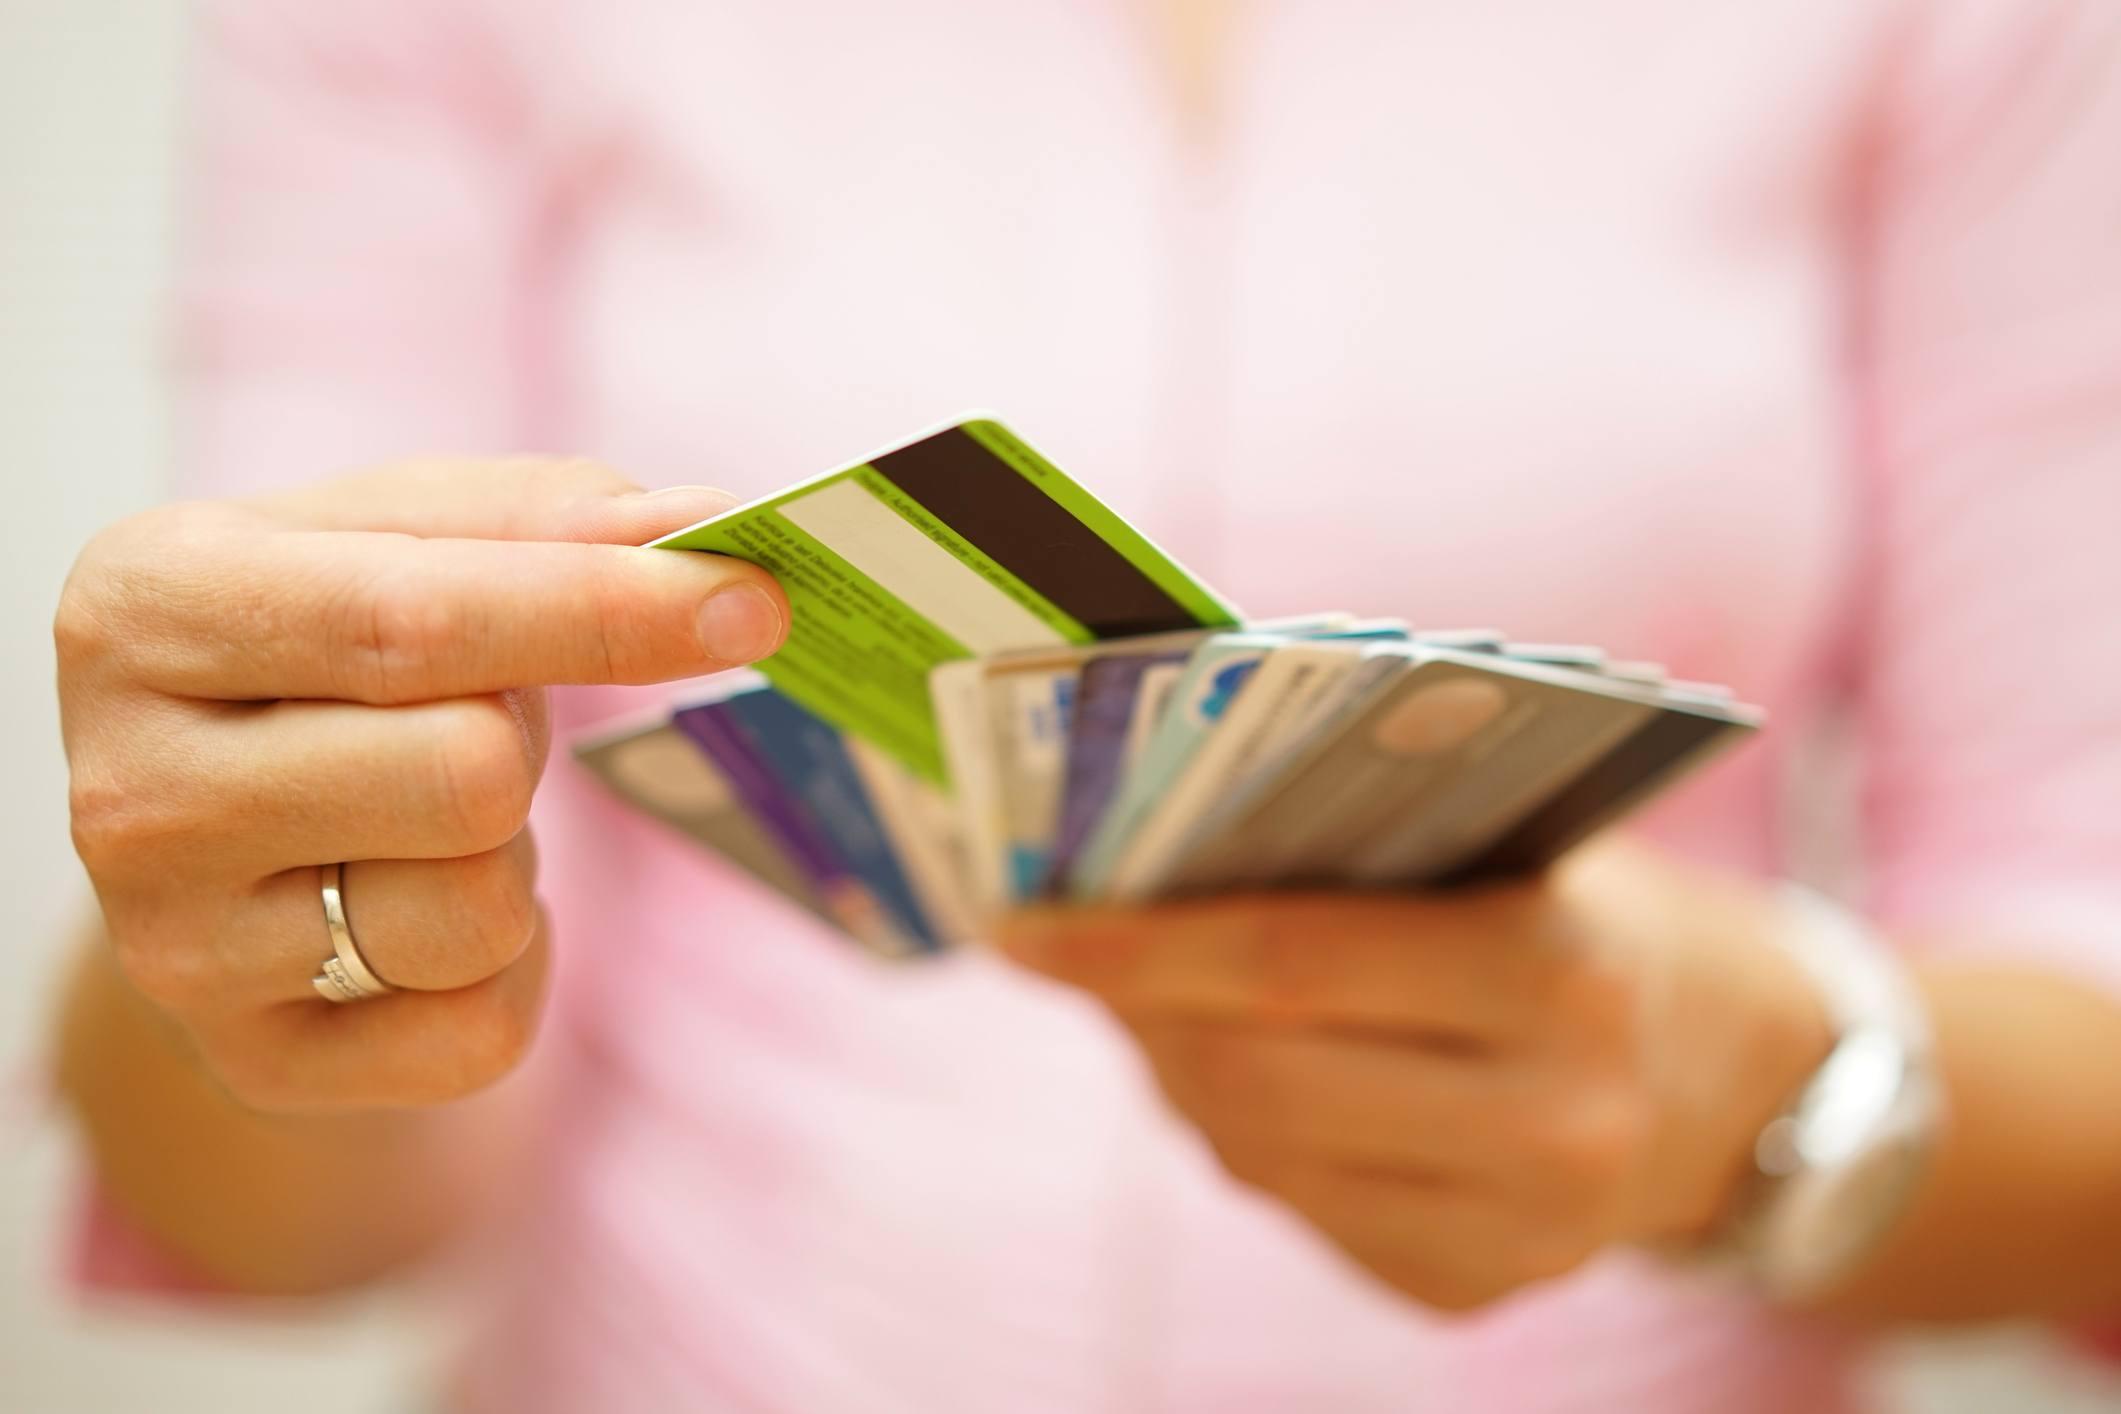 A woman chooses a credit card